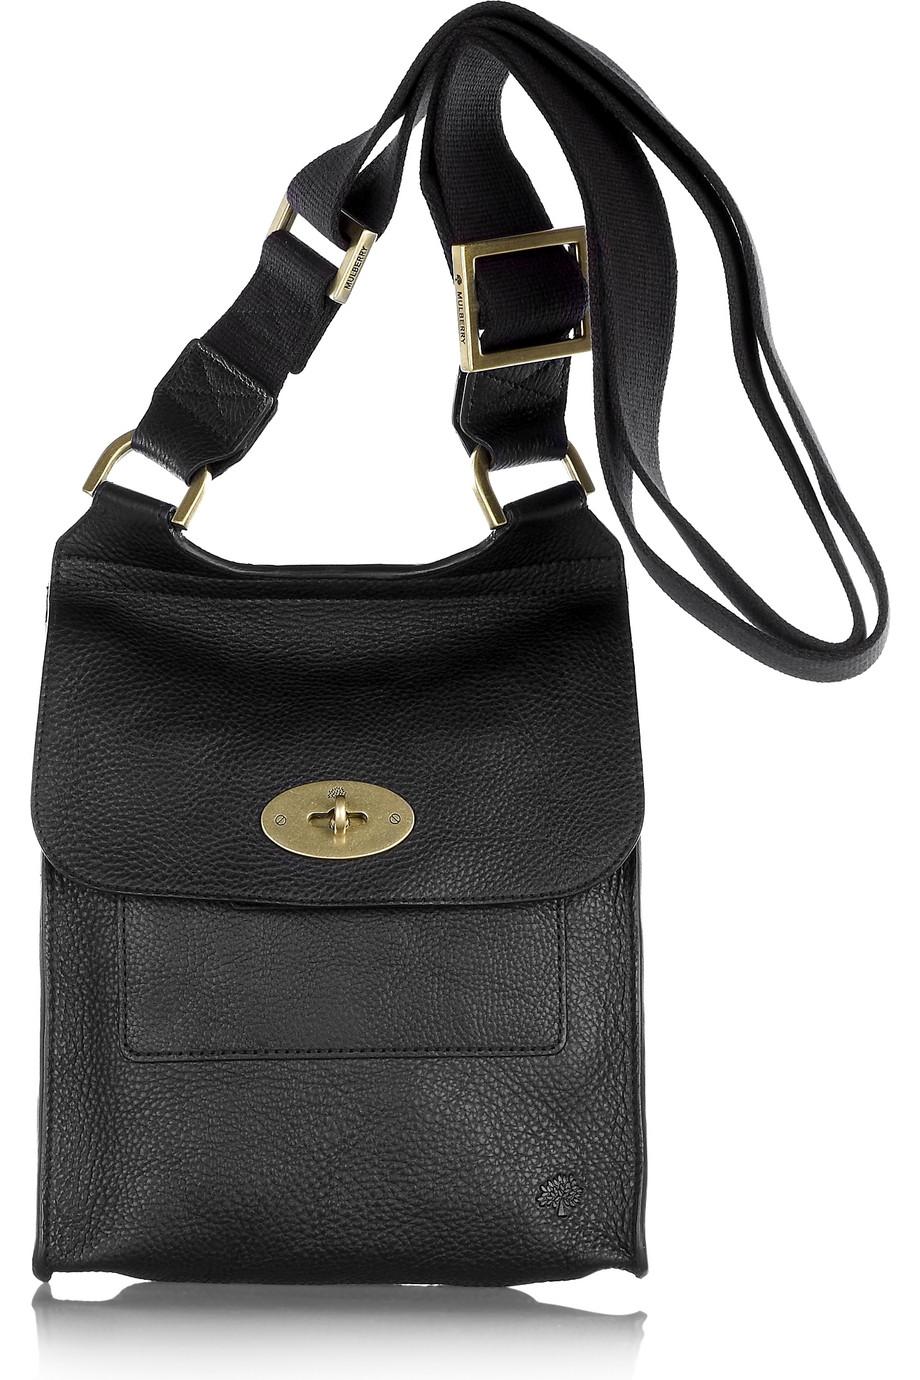 c97450cc3060 Lyst - Mulberry Antony Leather Crossbody Bag in Black